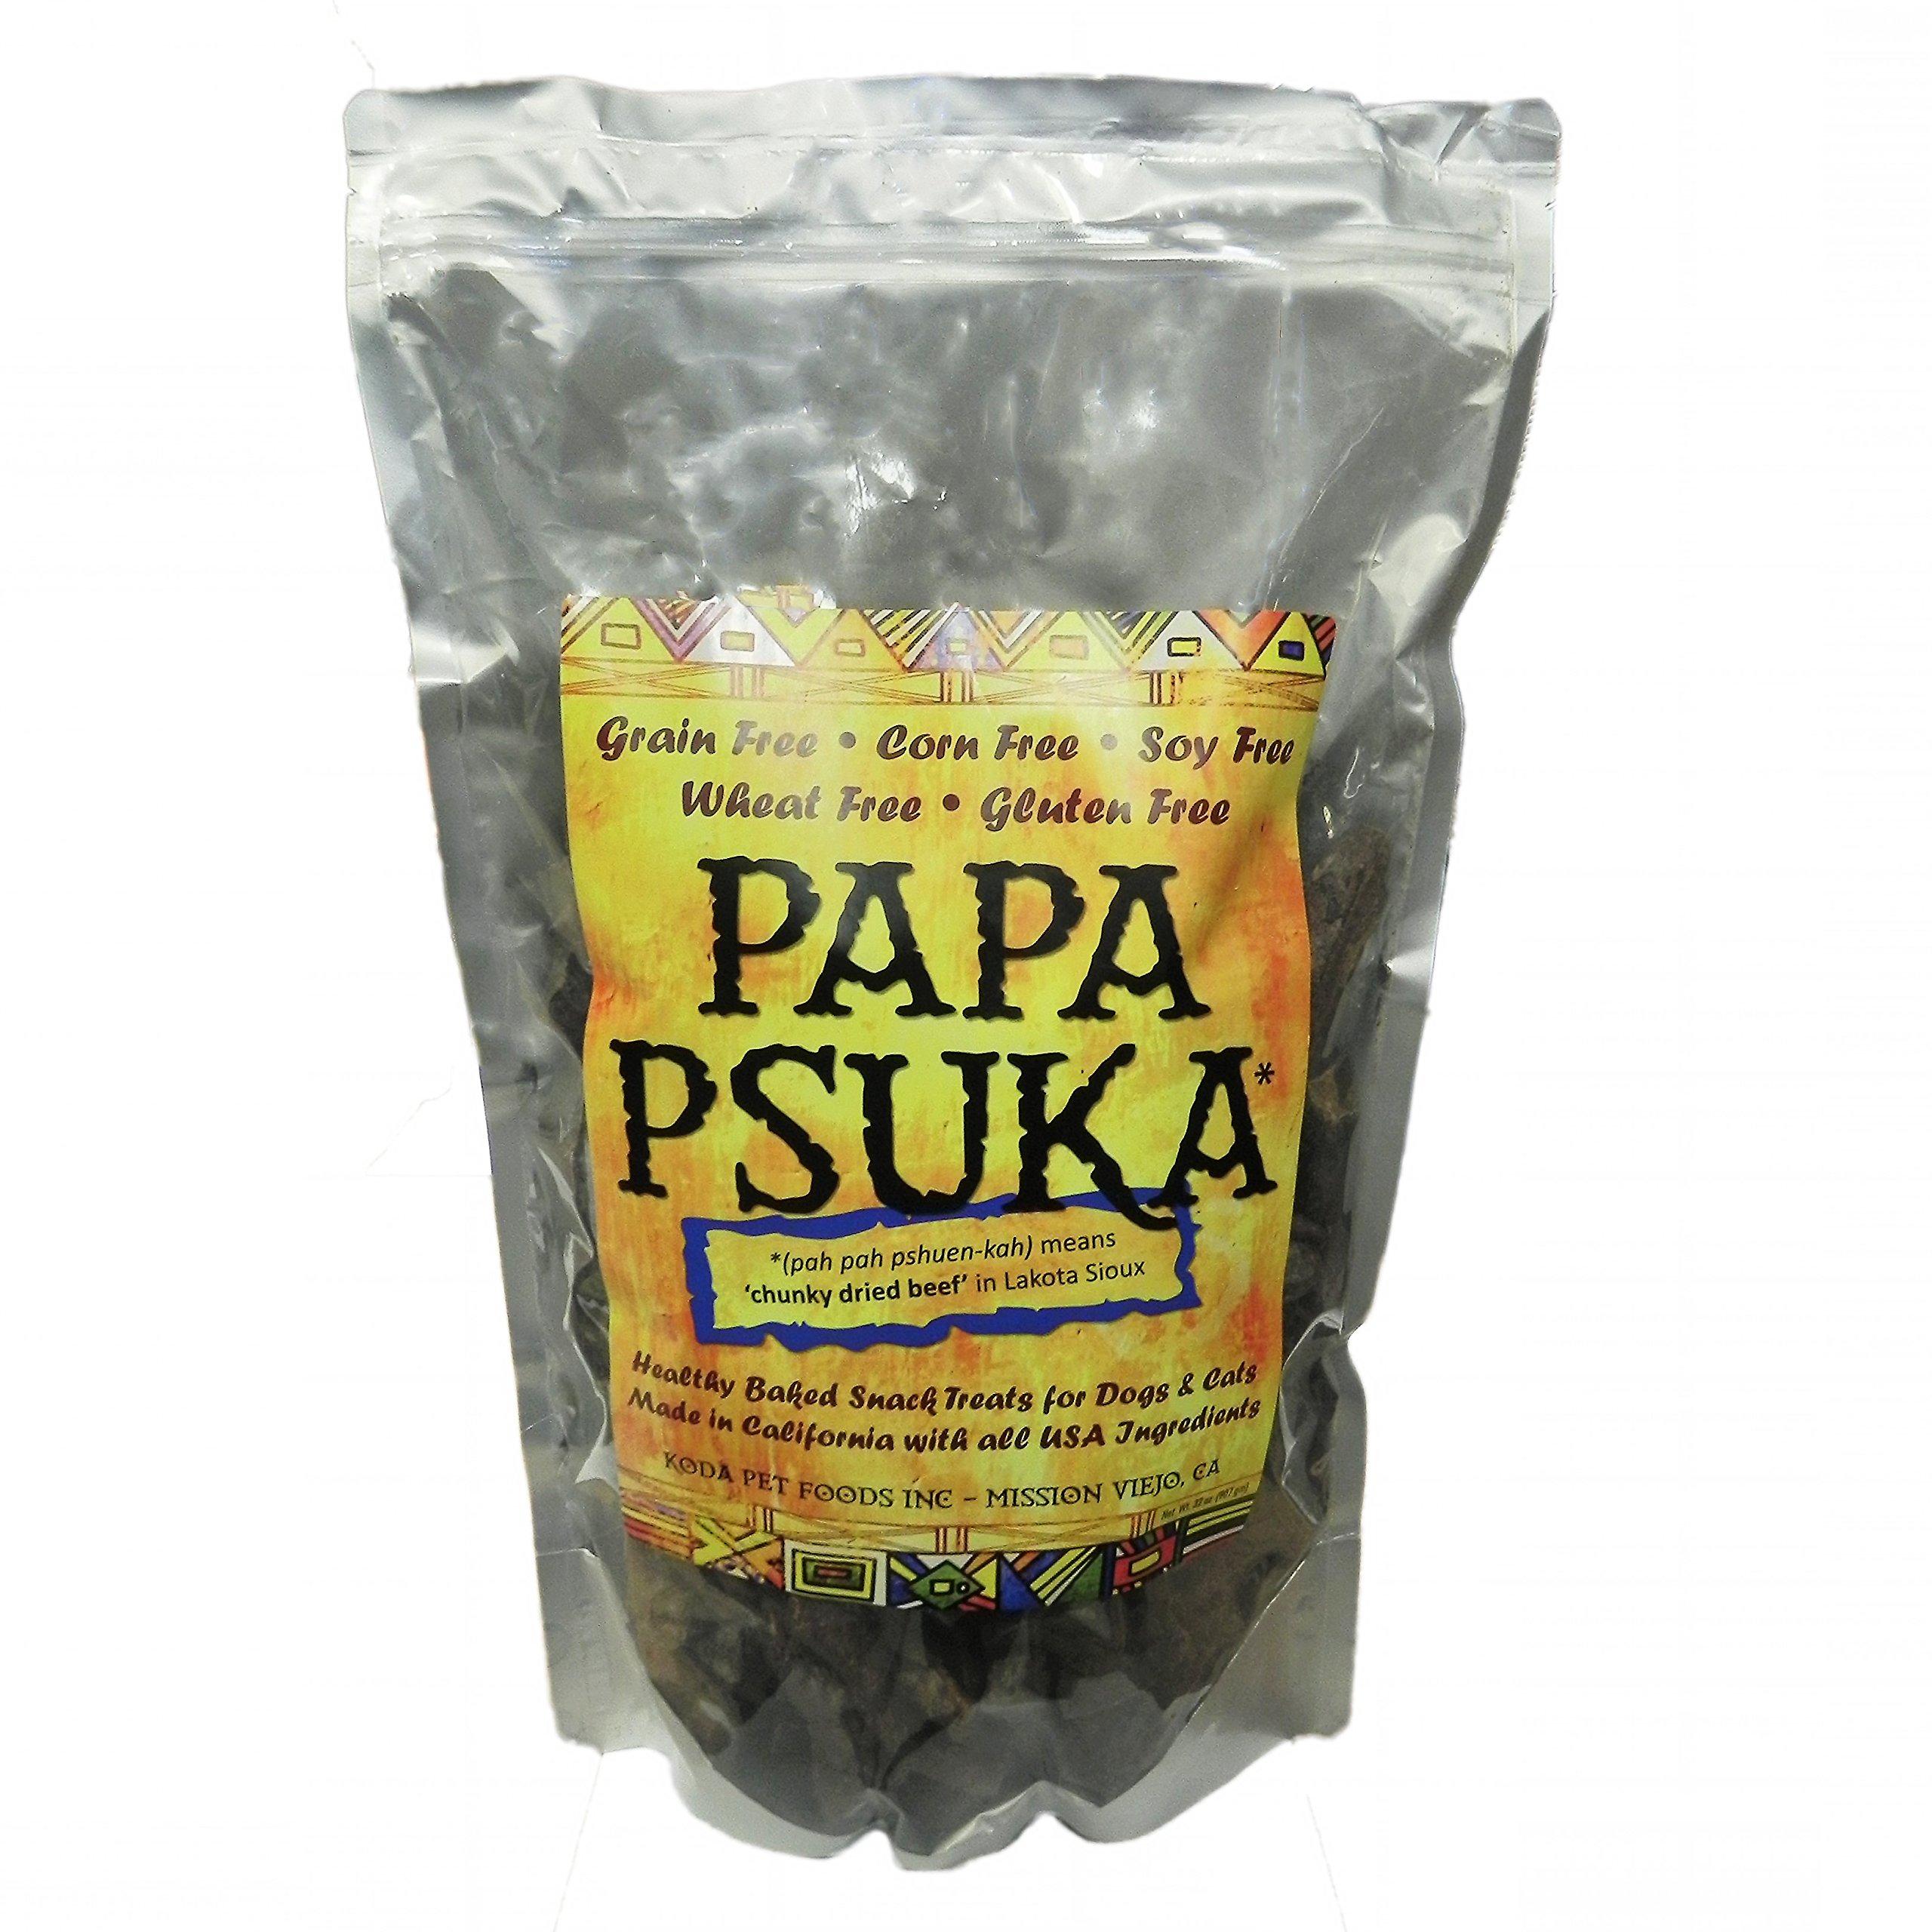 Koda Pet Papa Psuka - Baked Chunky Dried Meat 32oz by Koda Pet